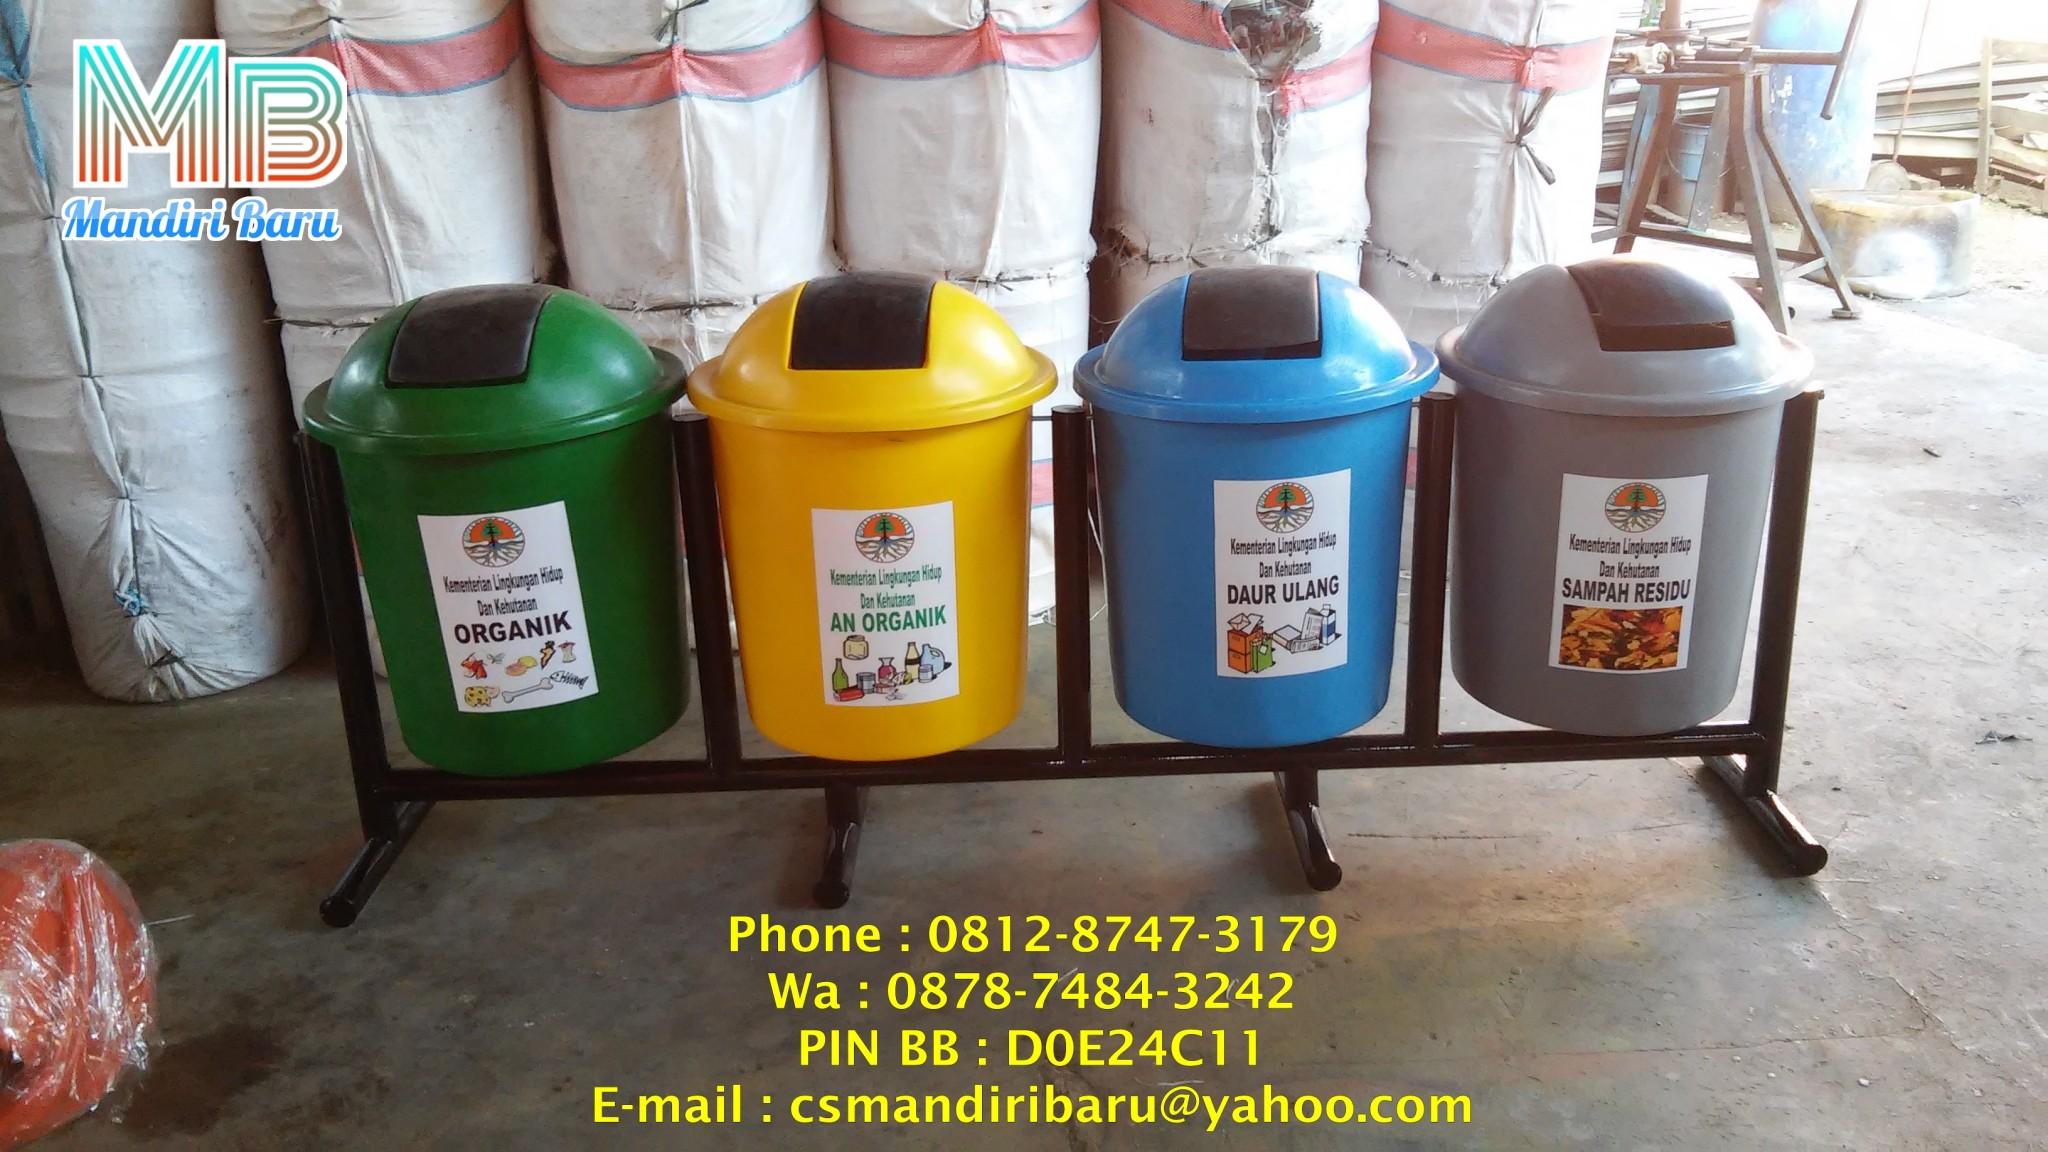 jual-tong-sampah-pilah-4-warna-bulat-swing-untuk-taman-sekolah-harga-murah-di-bandung-jakarta-medan-semarang